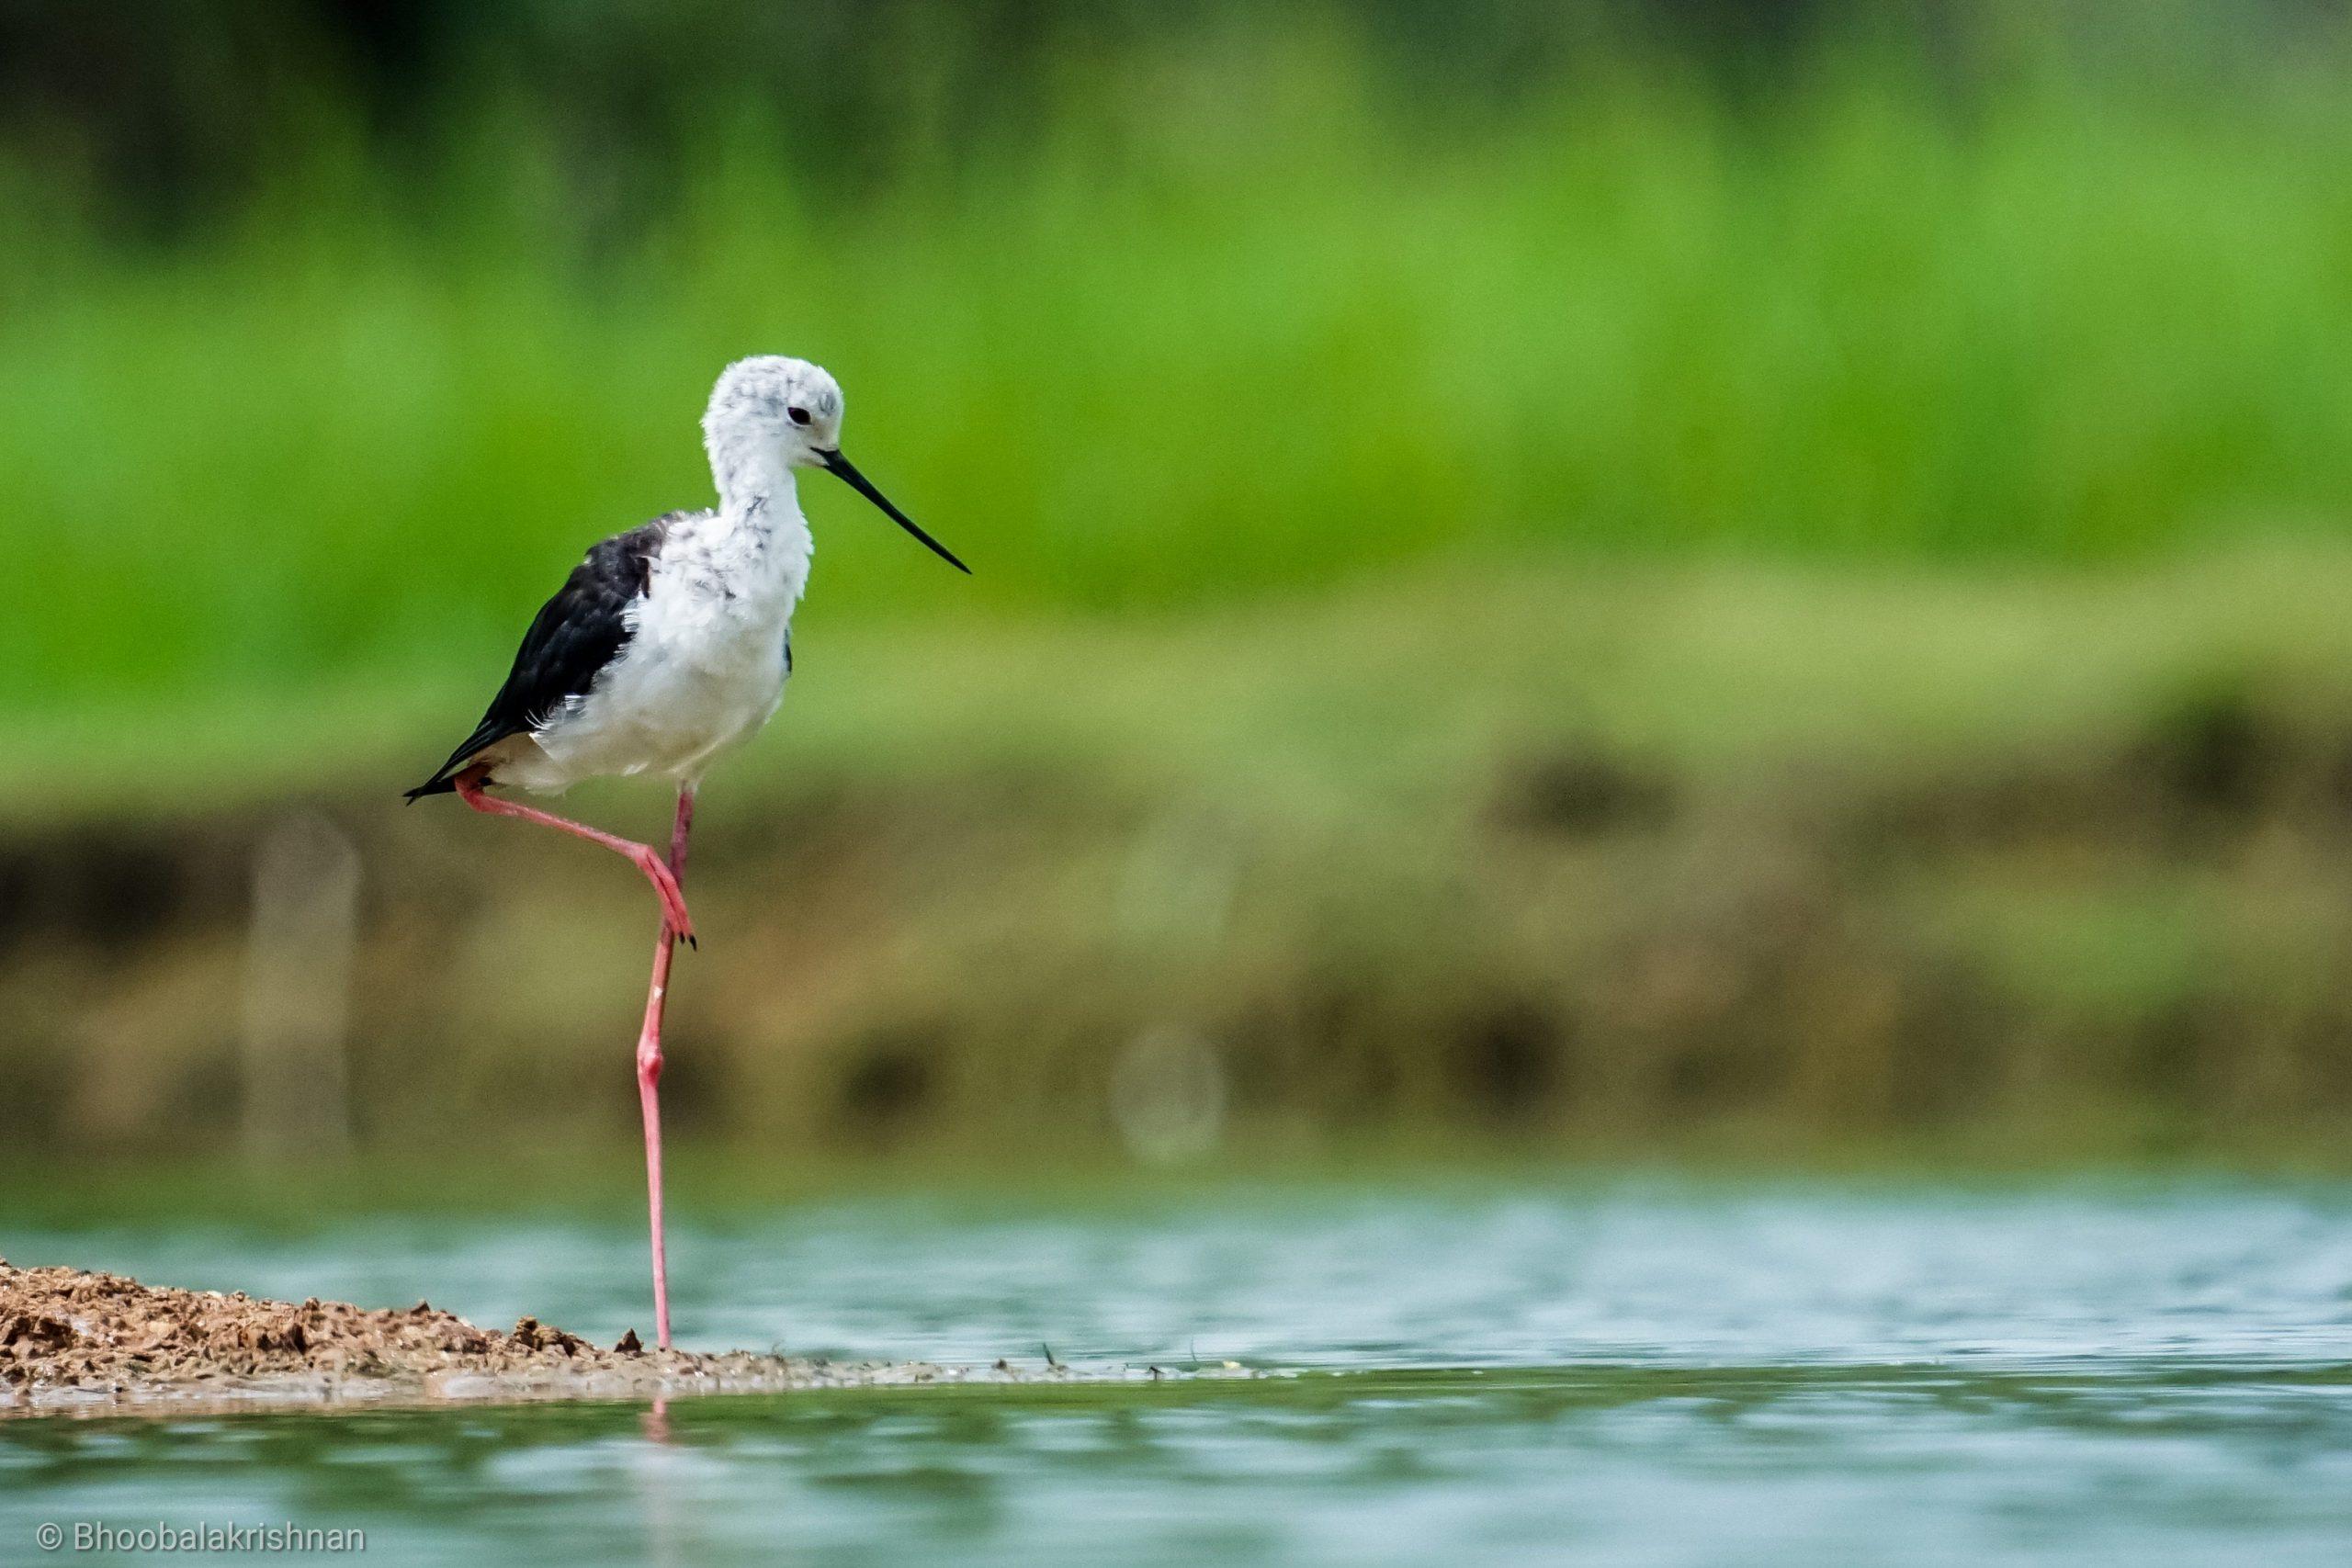 Black winged stilt in the river